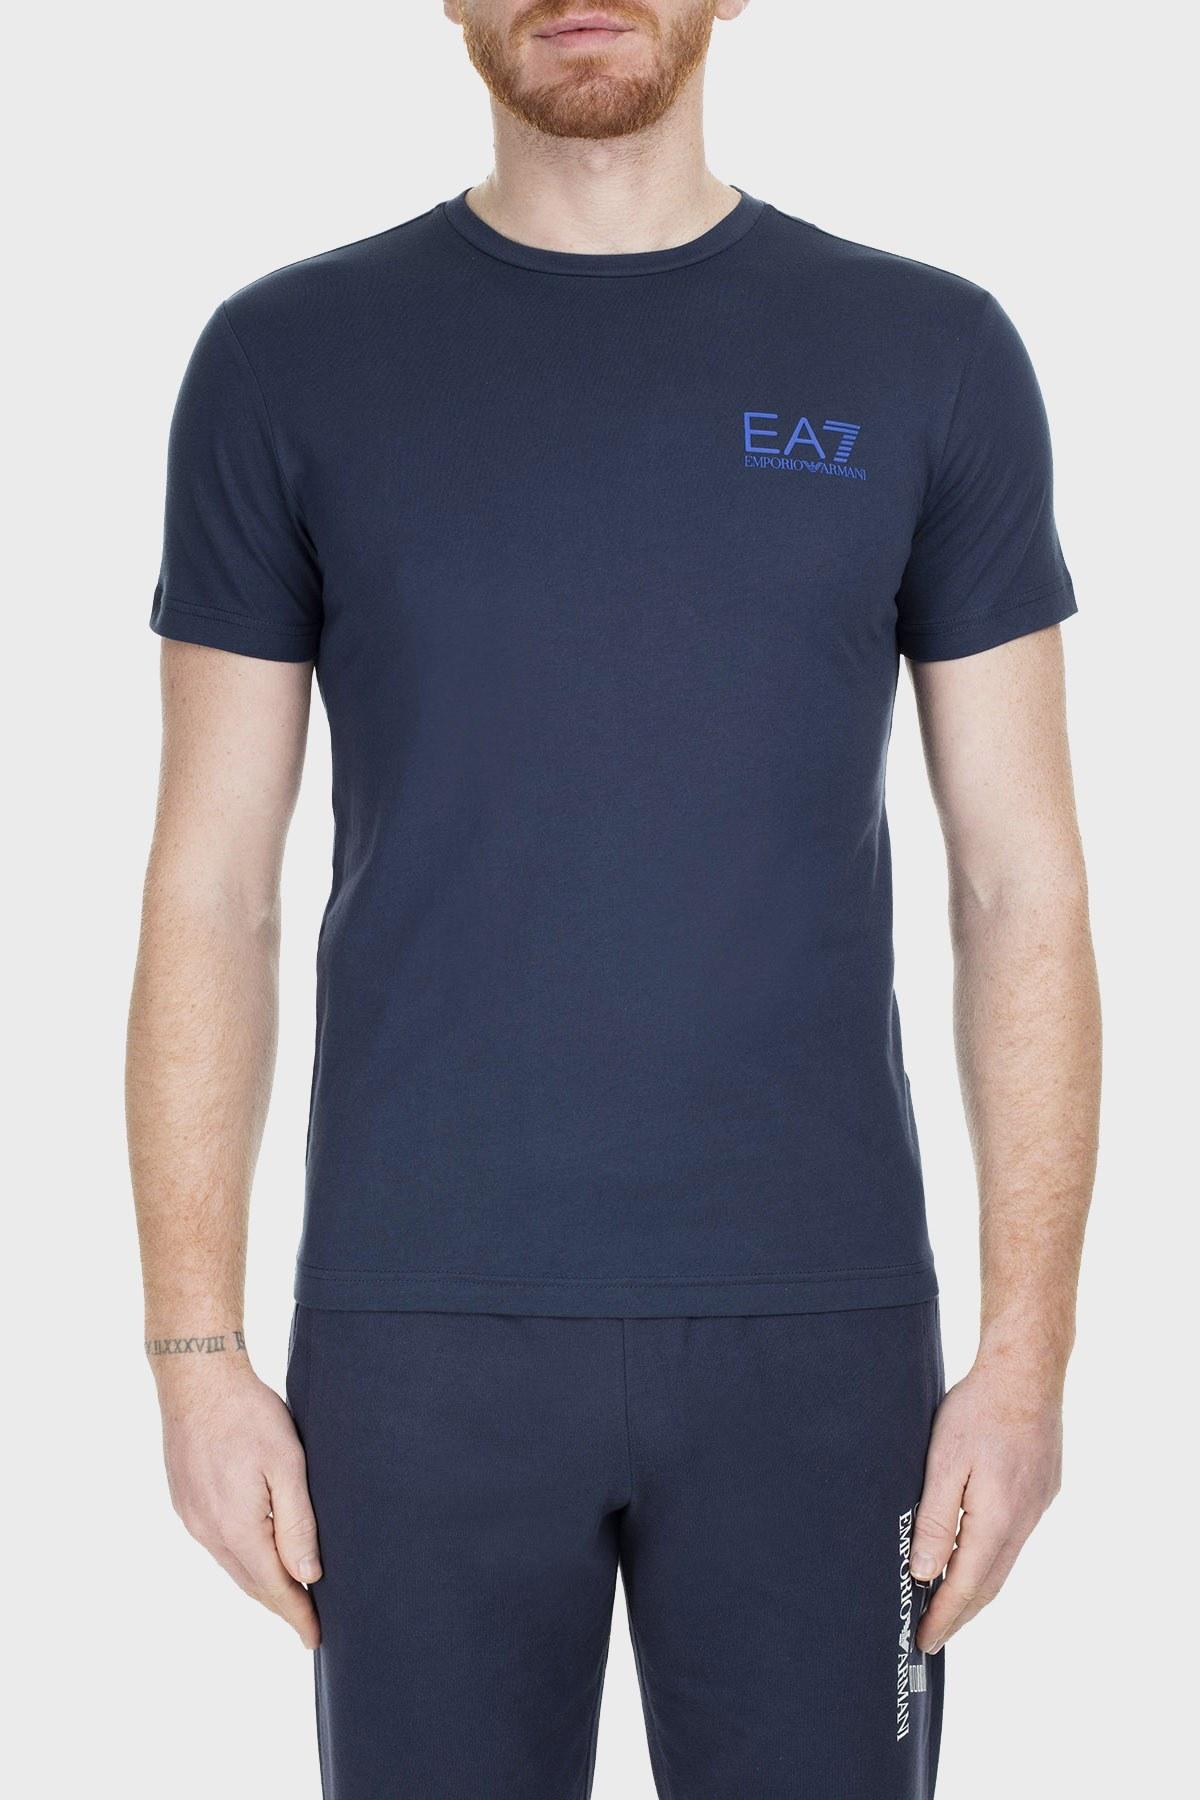 EA7 Erkek T Shirt S 3GPT05 PJ02Z 1554 LACİVERT